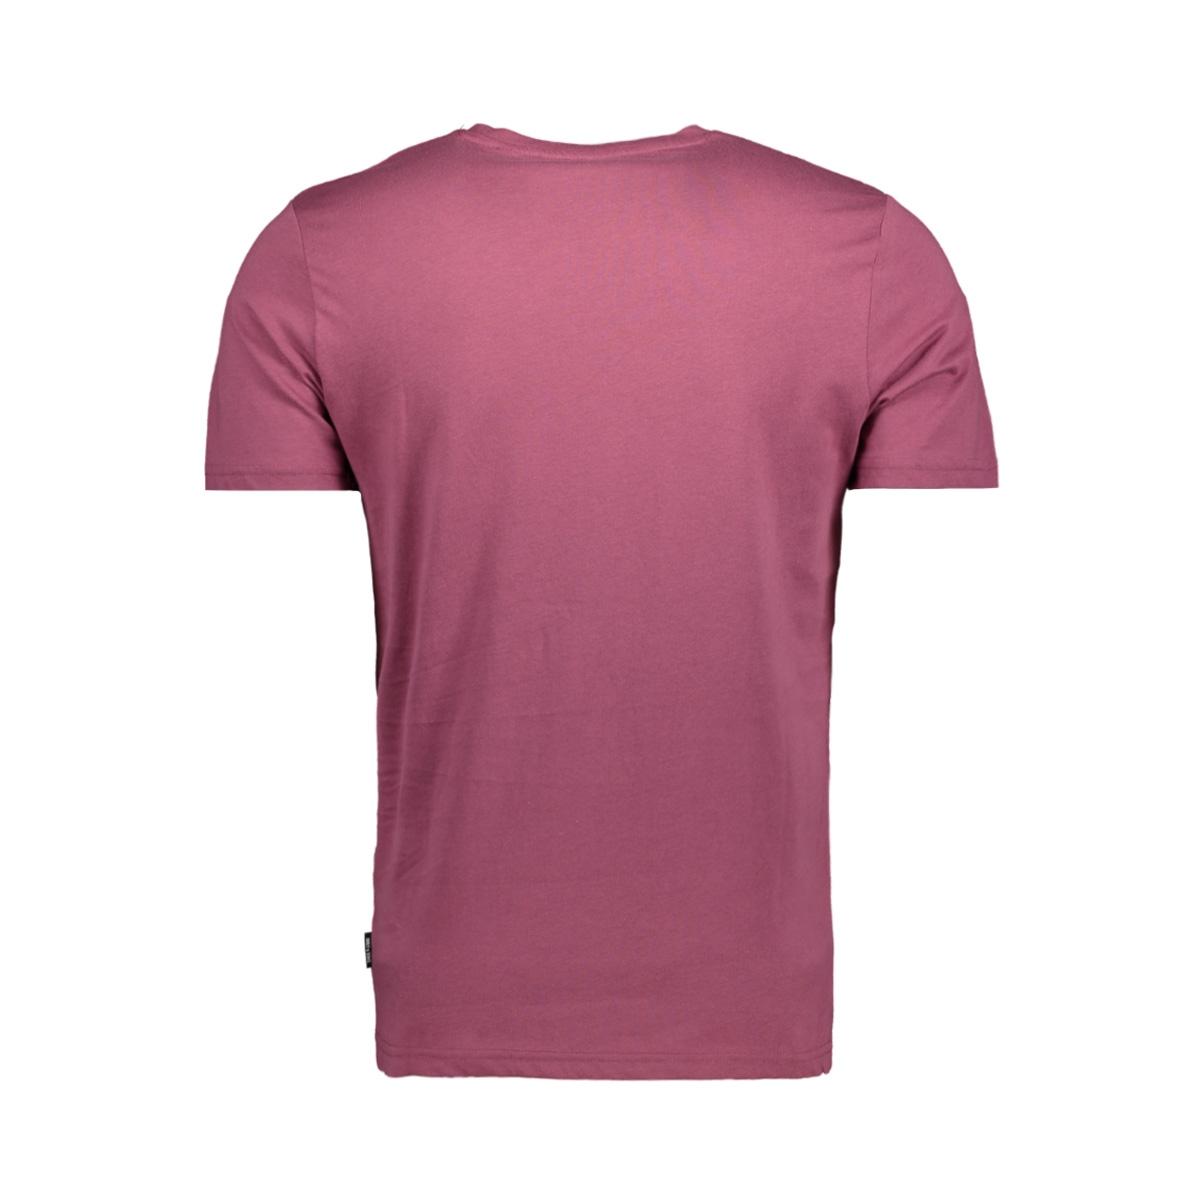 onsfinn ss tee 22010944 only & sons t-shirt maroon